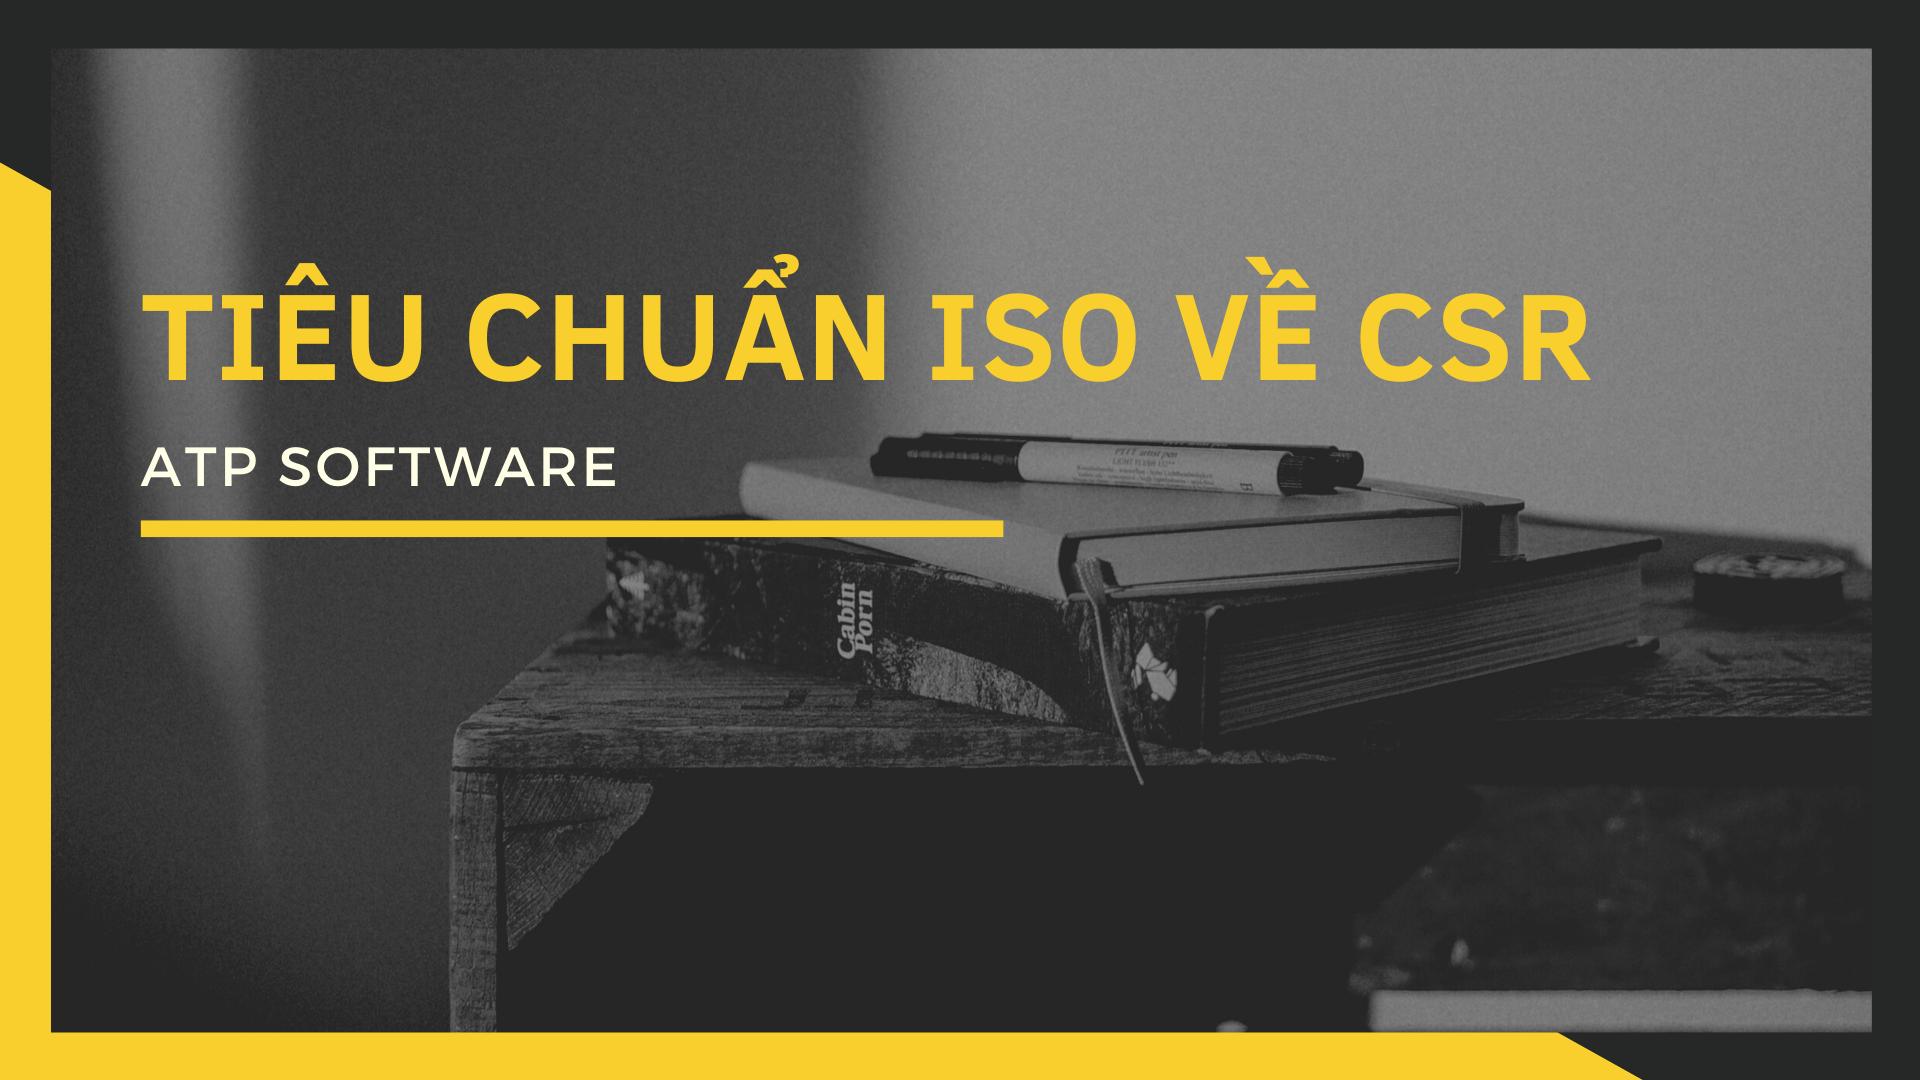 Tiêu chuẩn ISO về CSR